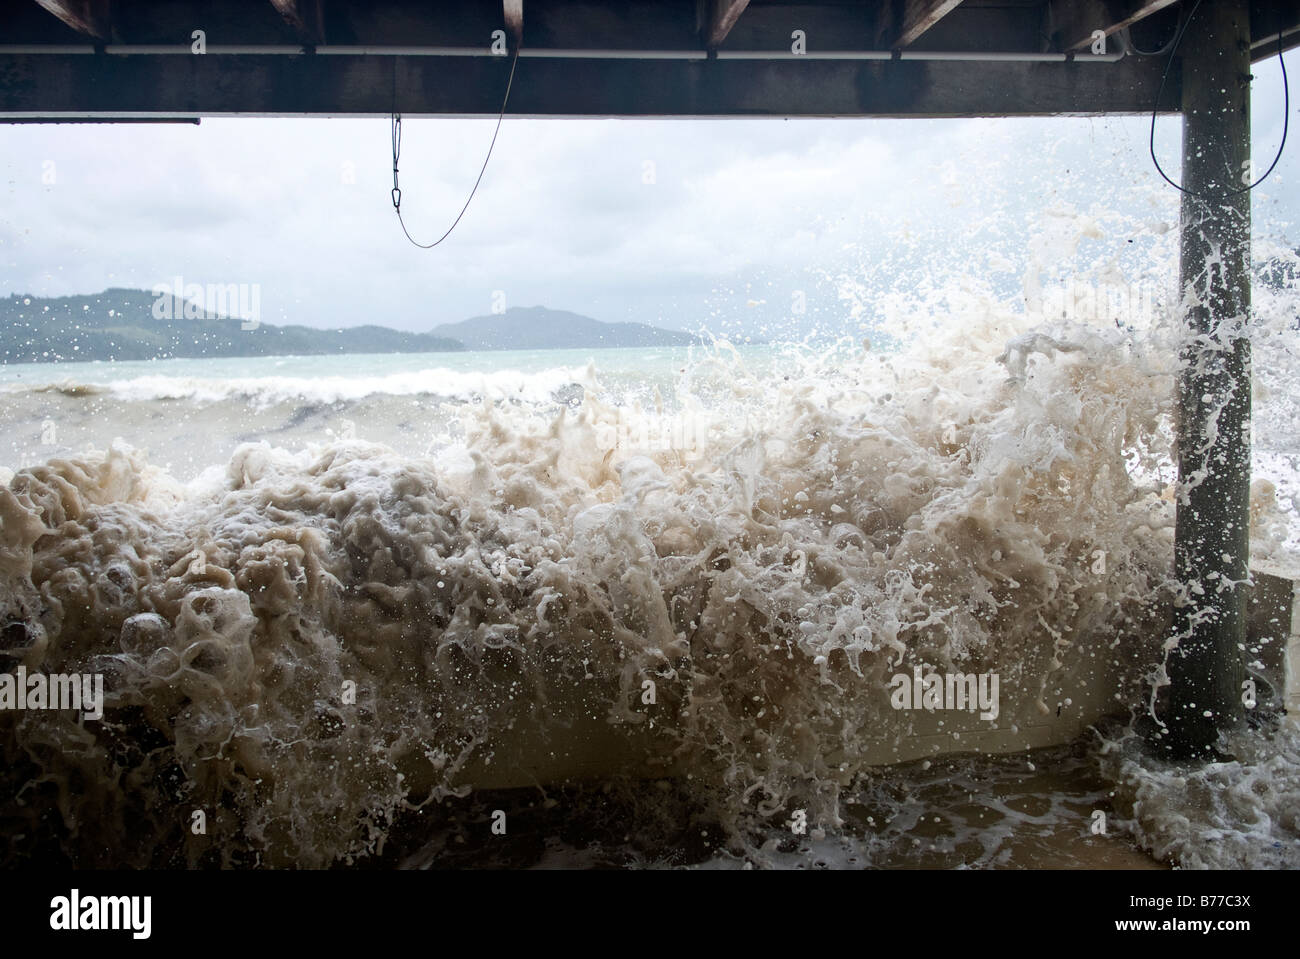 Sturmflut im Zyklon-Saison in Far North Queensland, Australien Stockbild